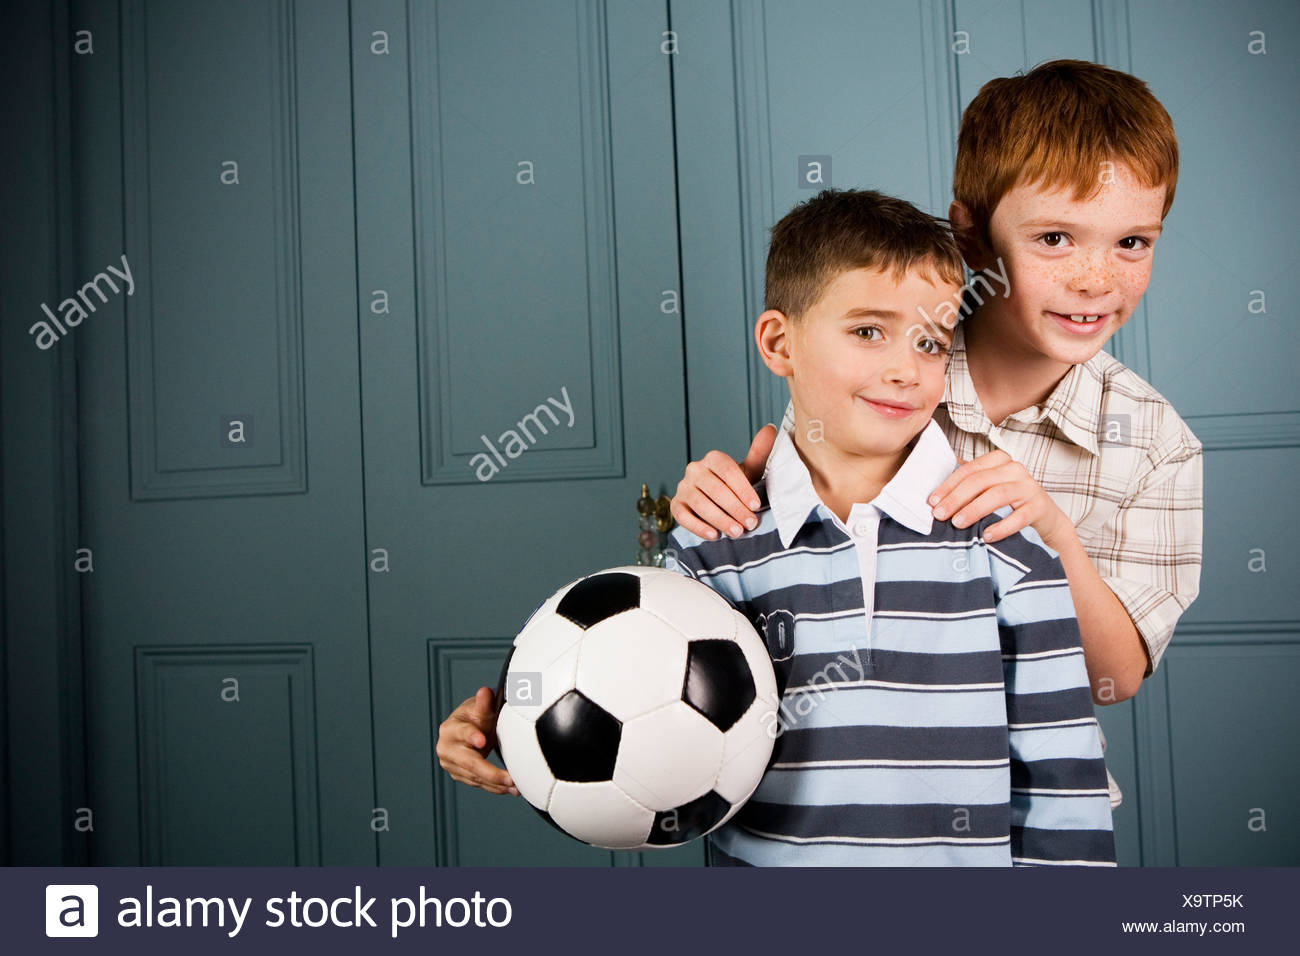 older boy standing behind younger boy hands on shoulders - Stock Image